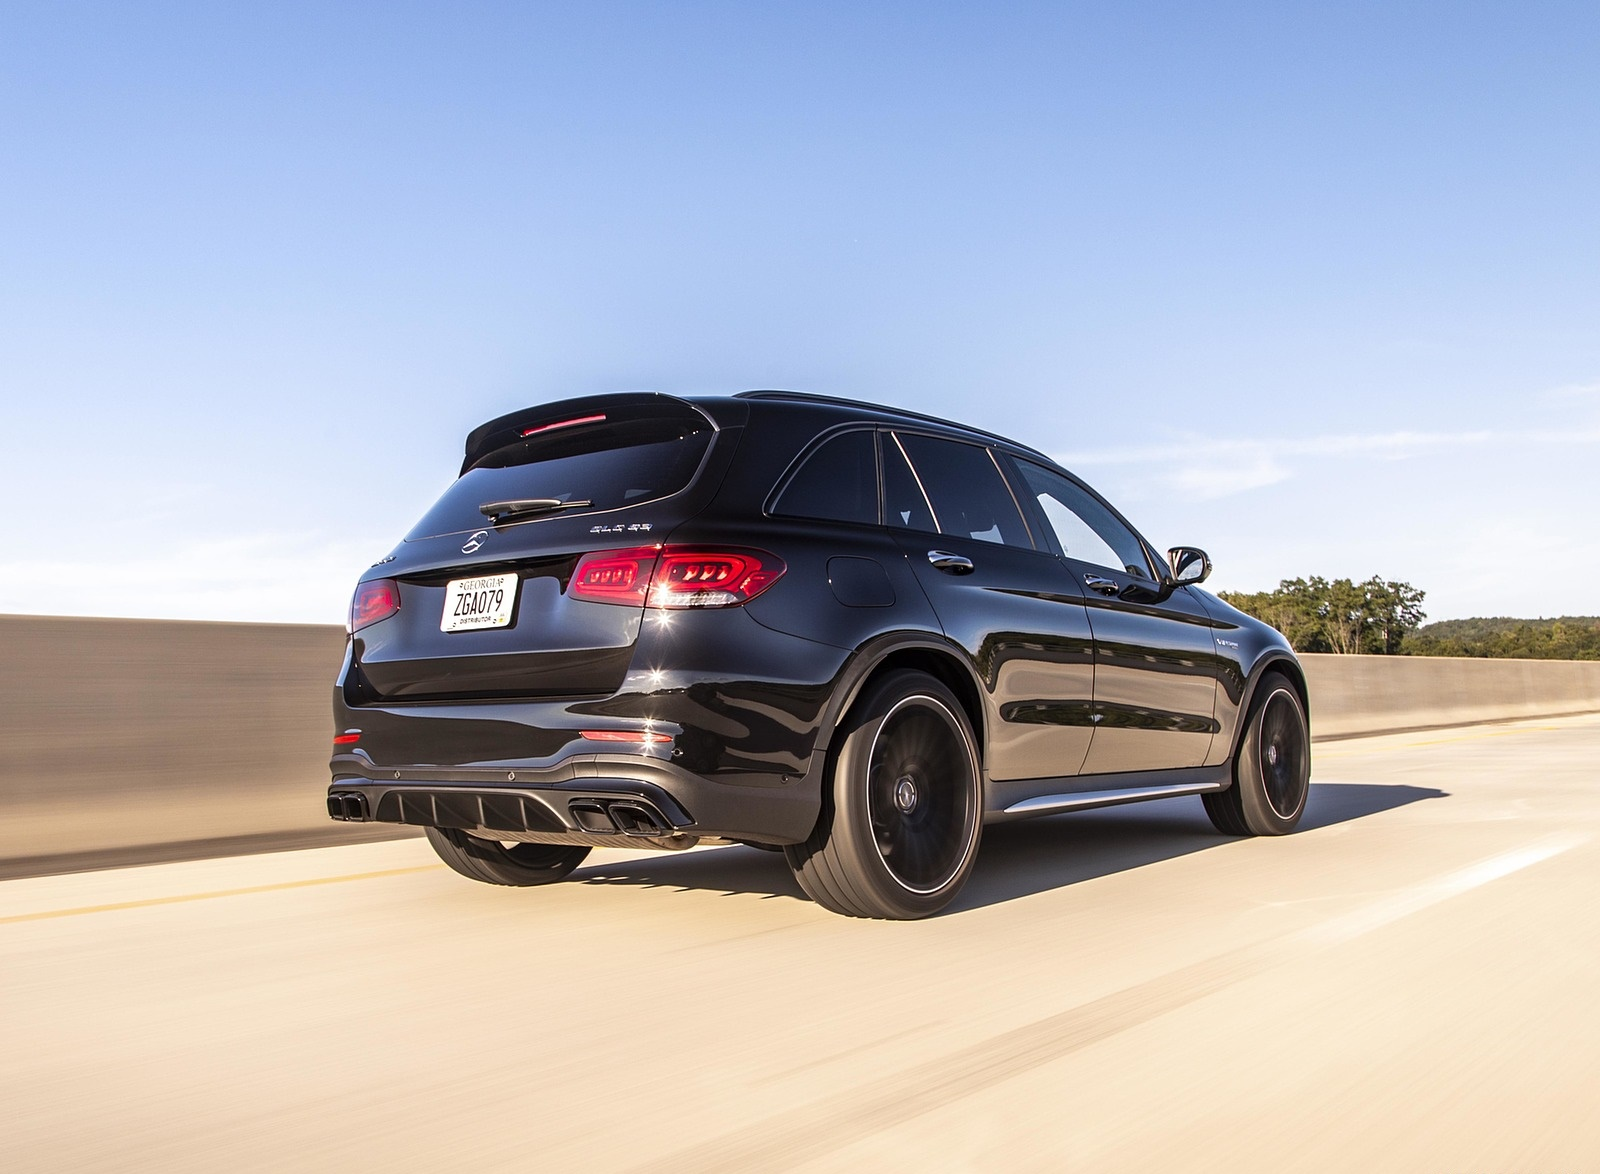 2020 Mercedes-AMG GLC 63 (US-Spec) Rear Three-Quarter Wallpapers (9)